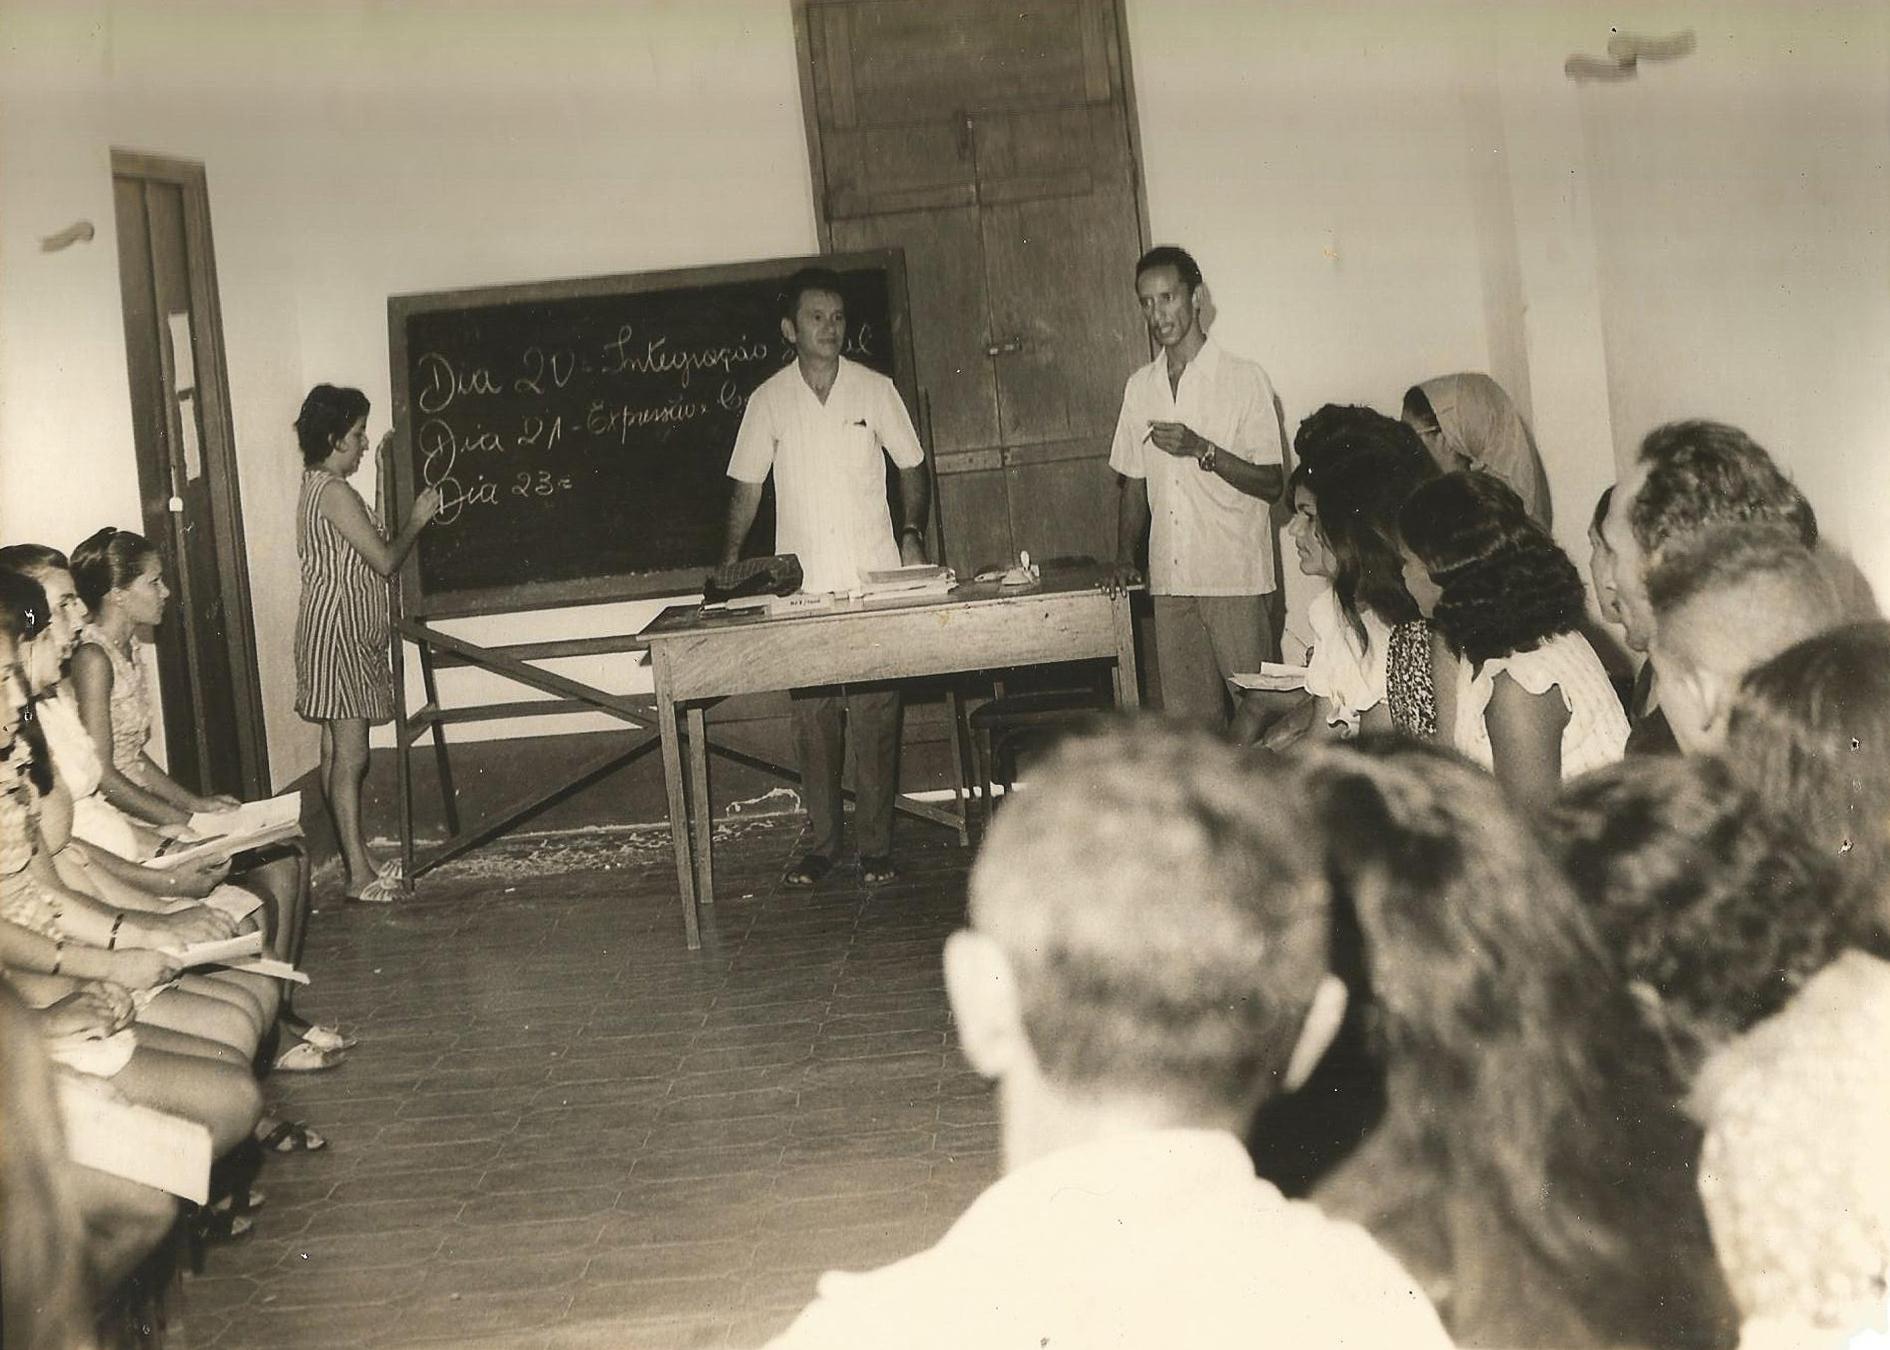 Treinamento de monitores - 19 a 23 de Fevereiro de 1973